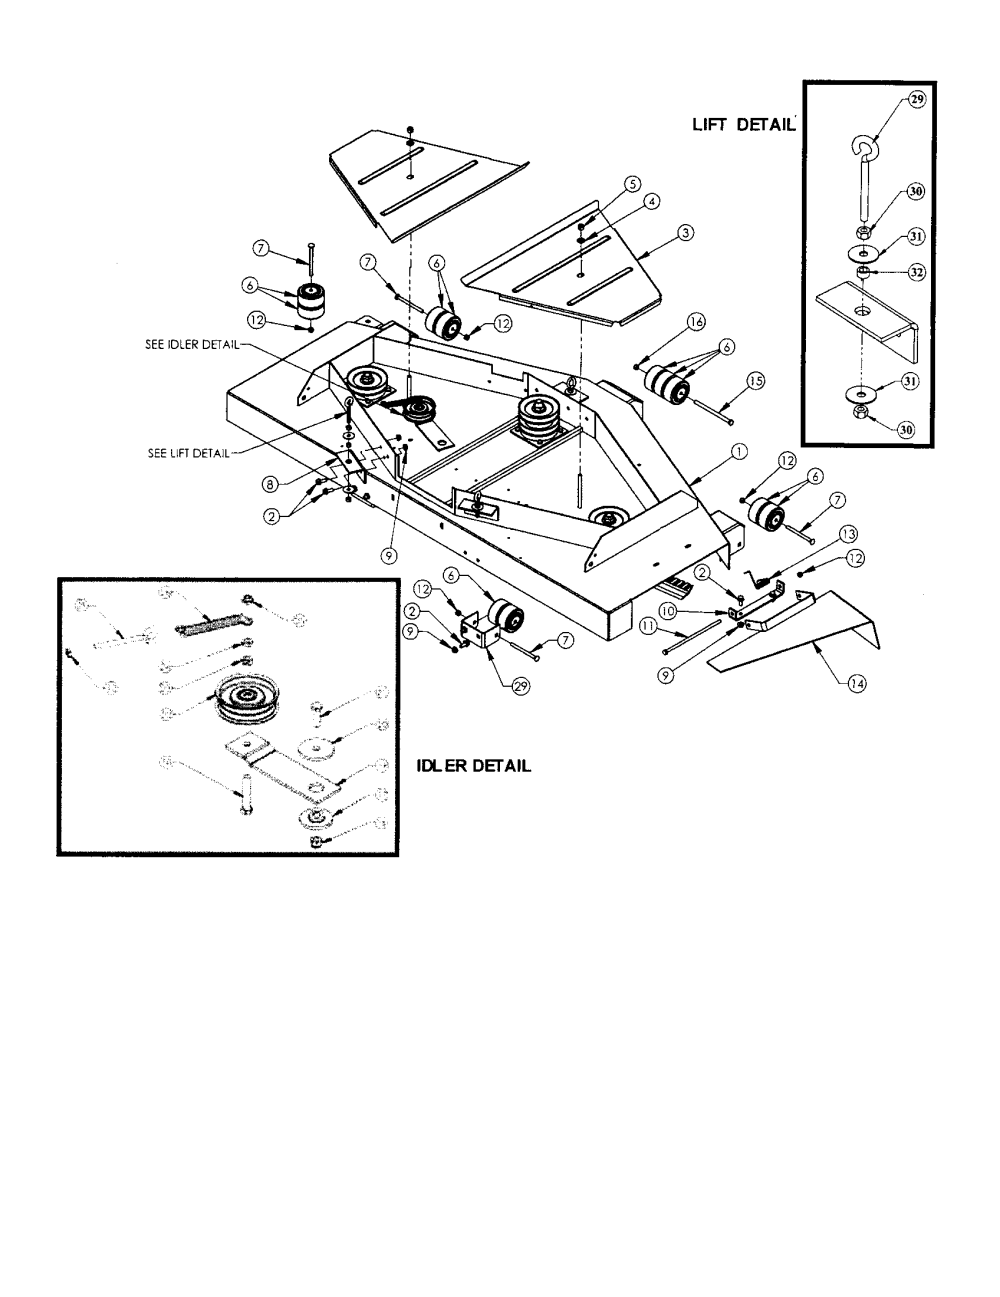 medium resolution of swisher wiring harness wiring diagram z4swisher wiring harness wiring diagram schema alpine stereo harness swisher wiring